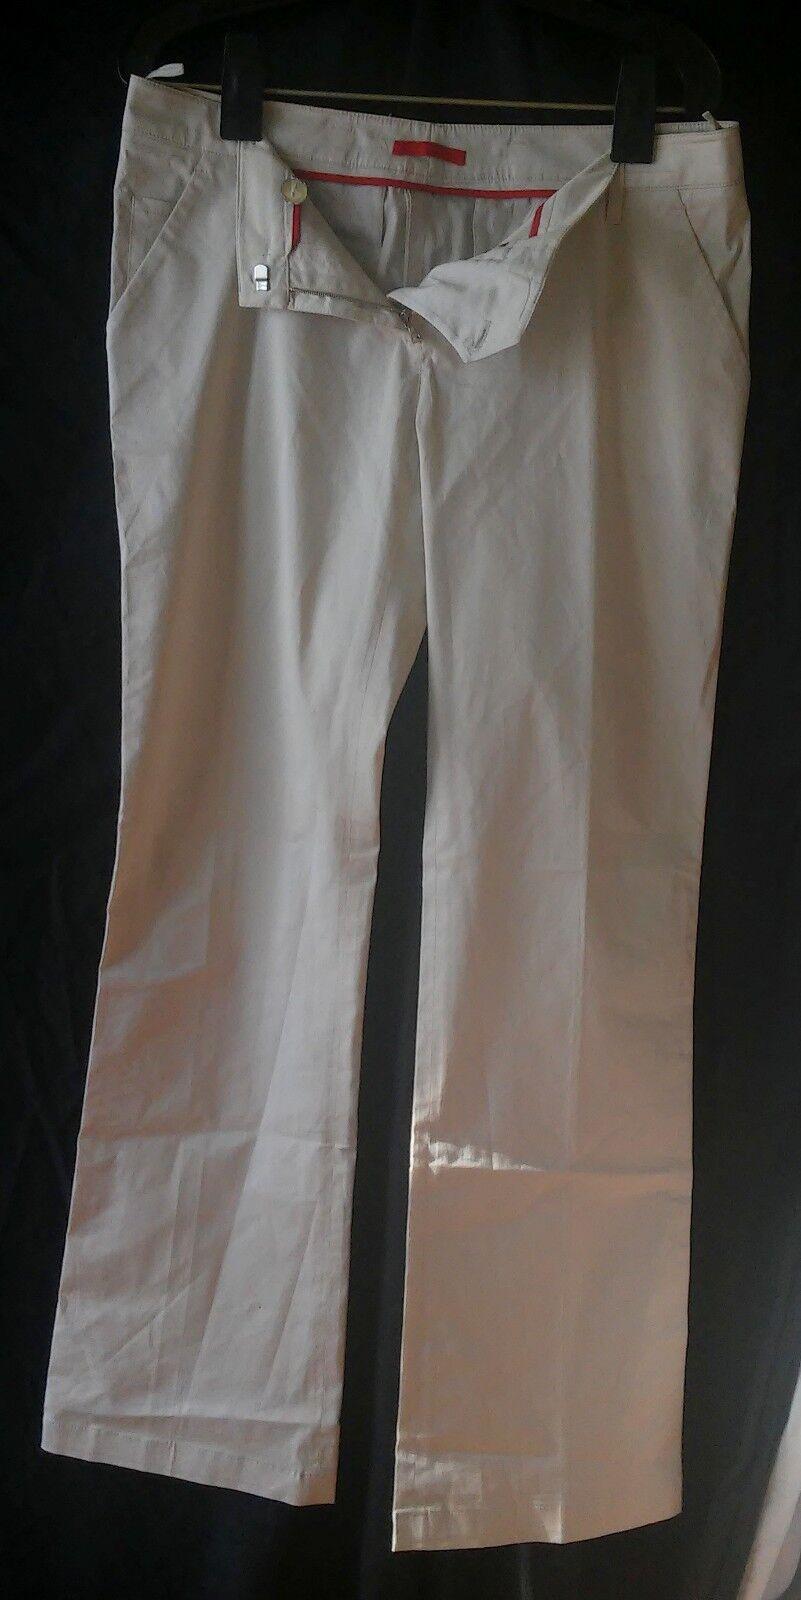 Prada cotton blend Pants Size 42 L - Waist 16 +16